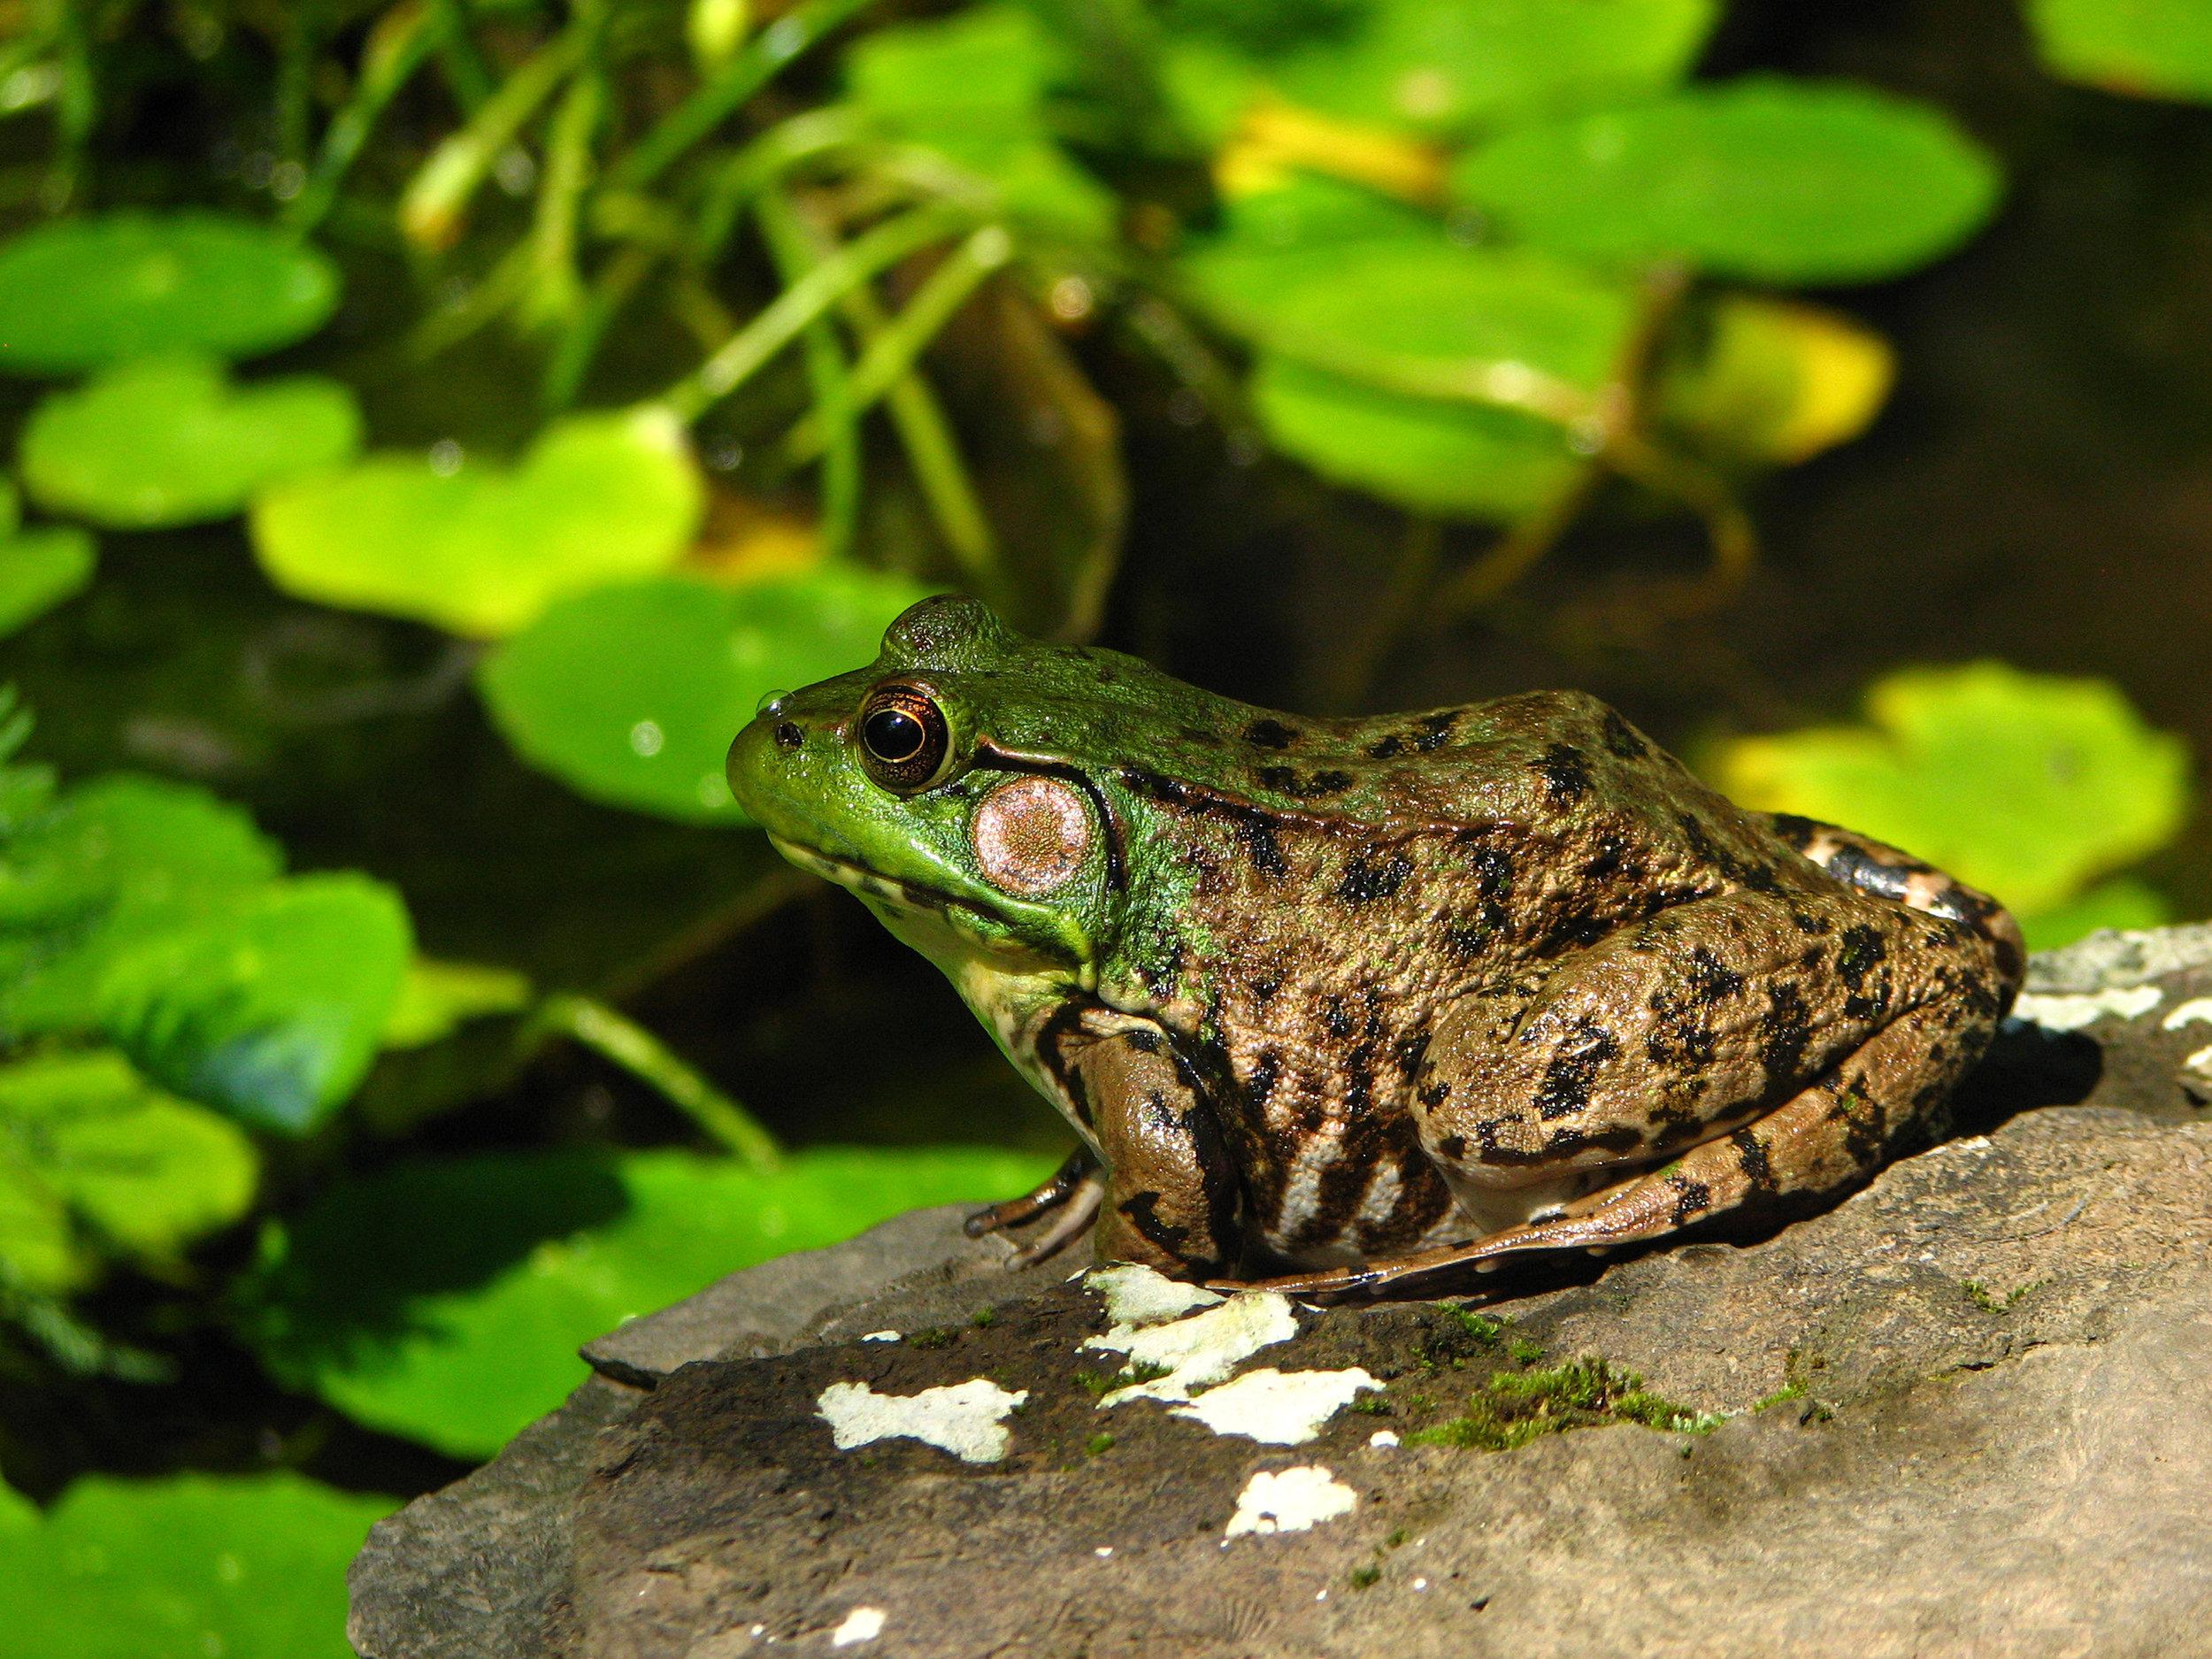 frogs pond 049 copy 2.jpg